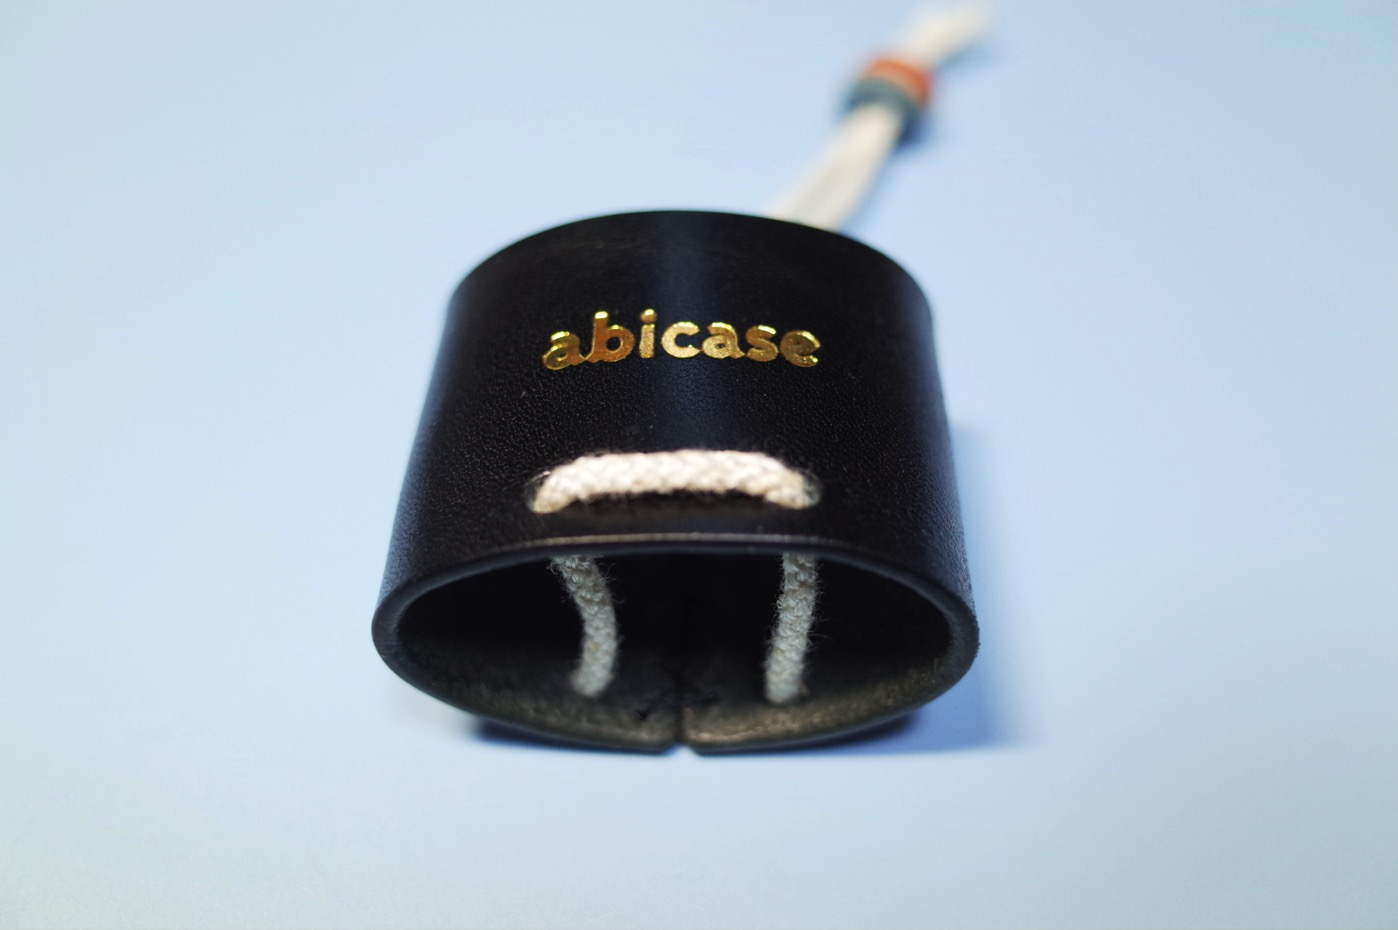 abicase-6